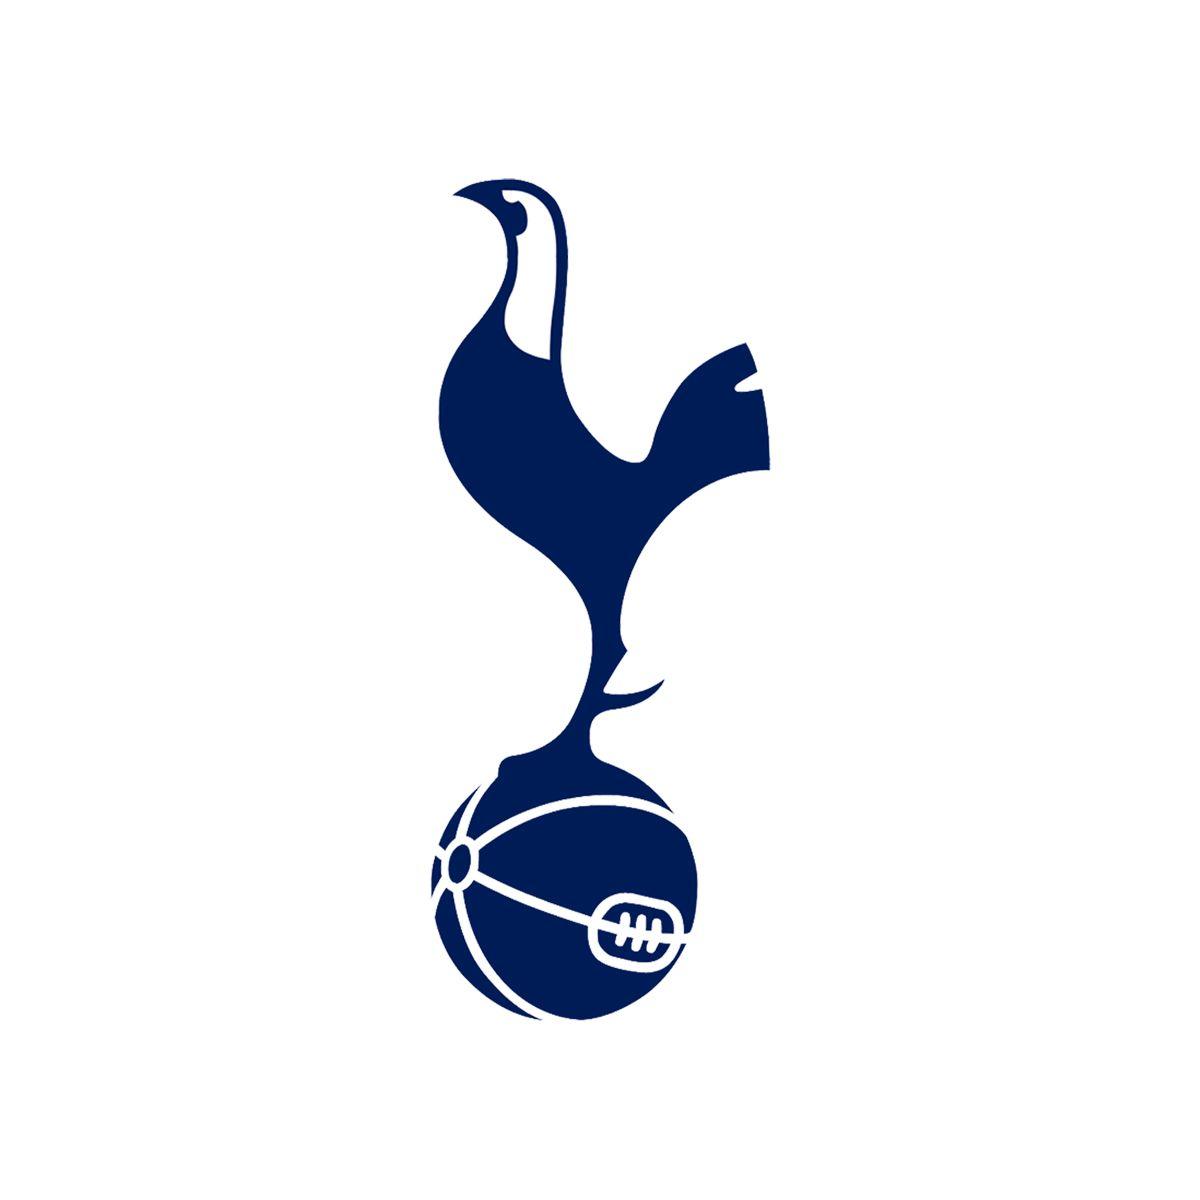 Tottenham Hotspur Logo Spurs Logo Tottenham Hotspur Tottenham Hotspur Football